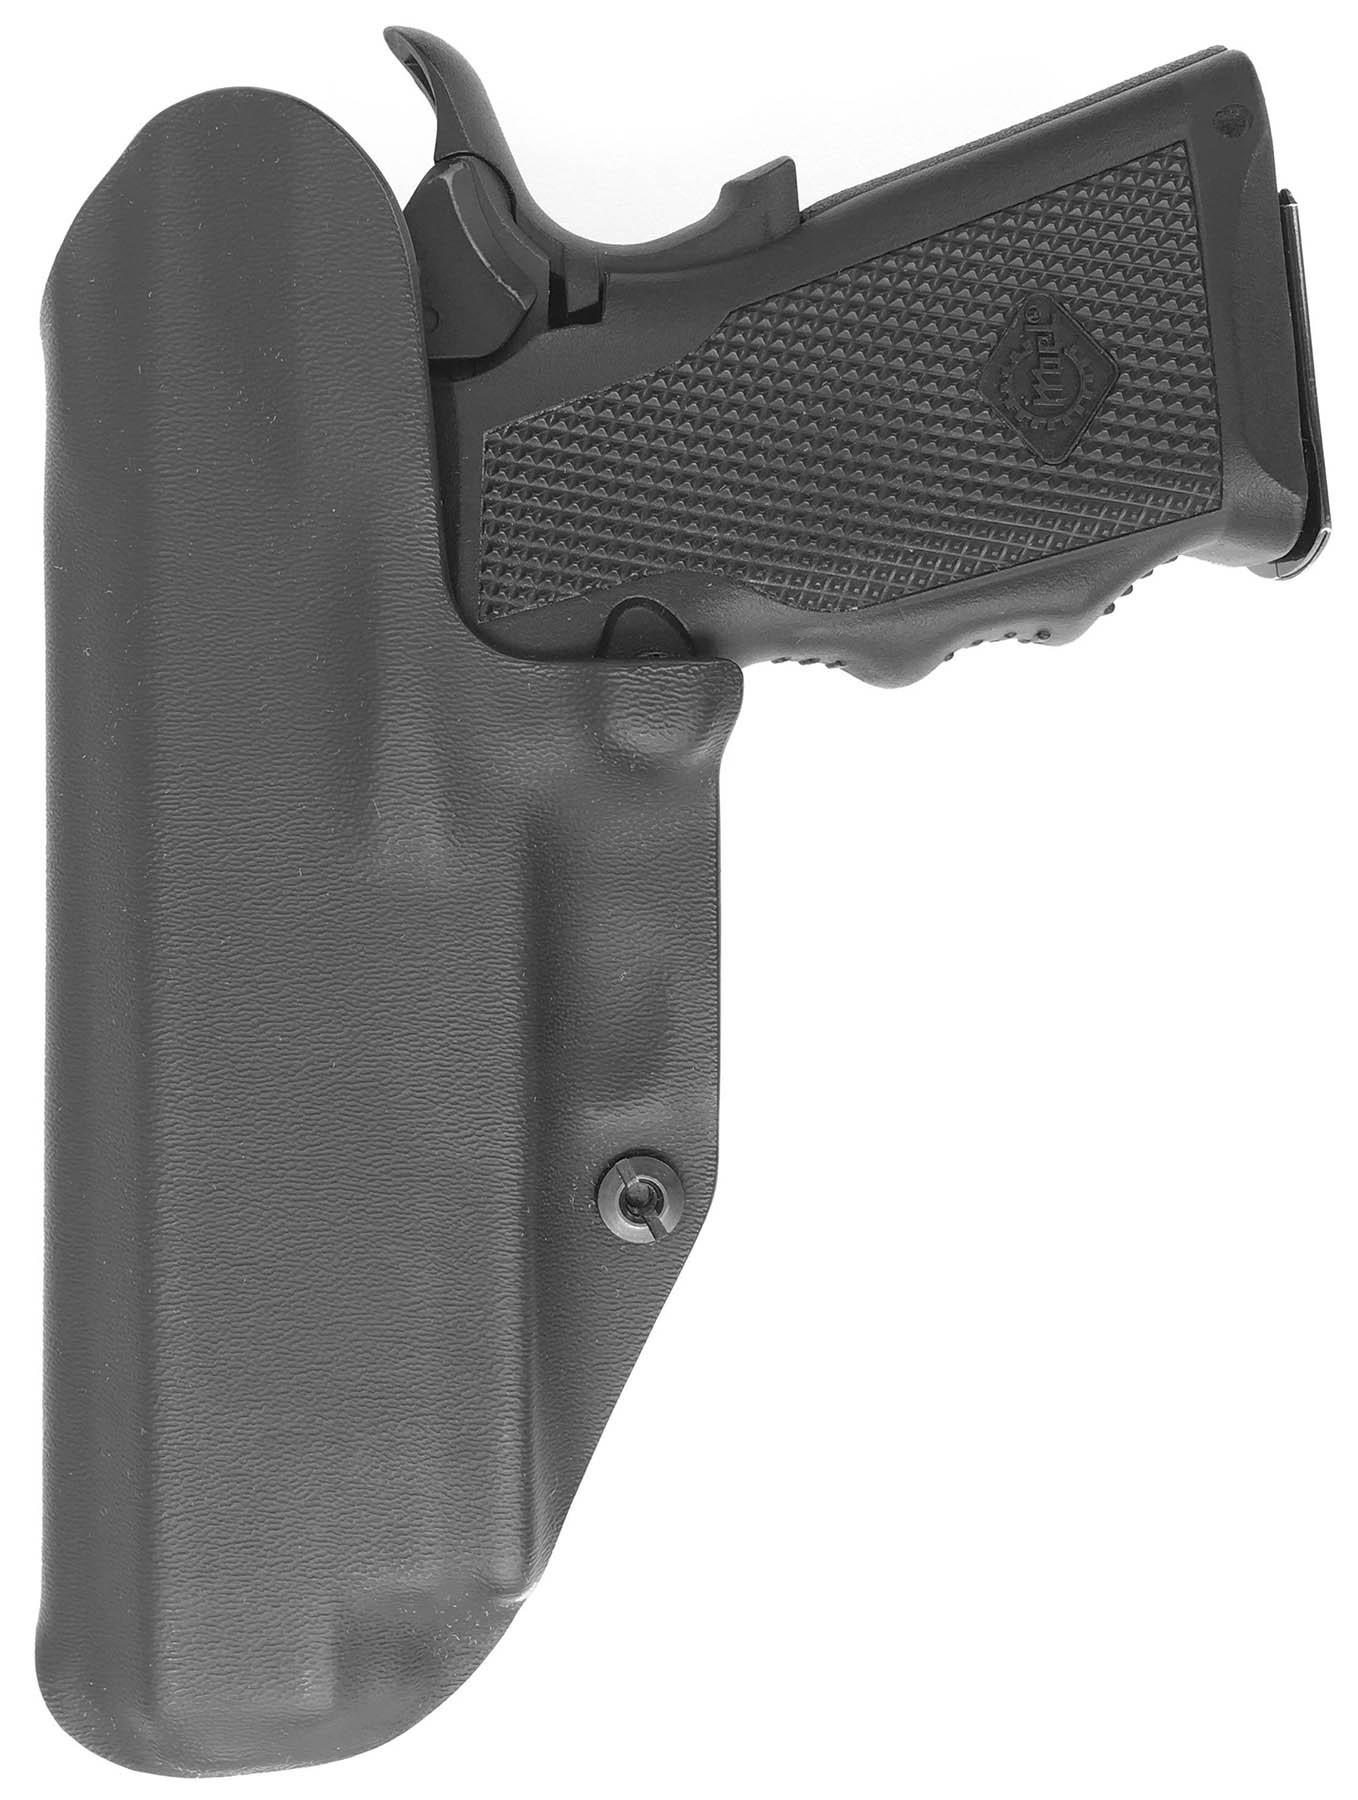 Coldre [MD6TC] Kydex Slim Kydex® 080 + Porta-Carregador Saque Rápido Velado